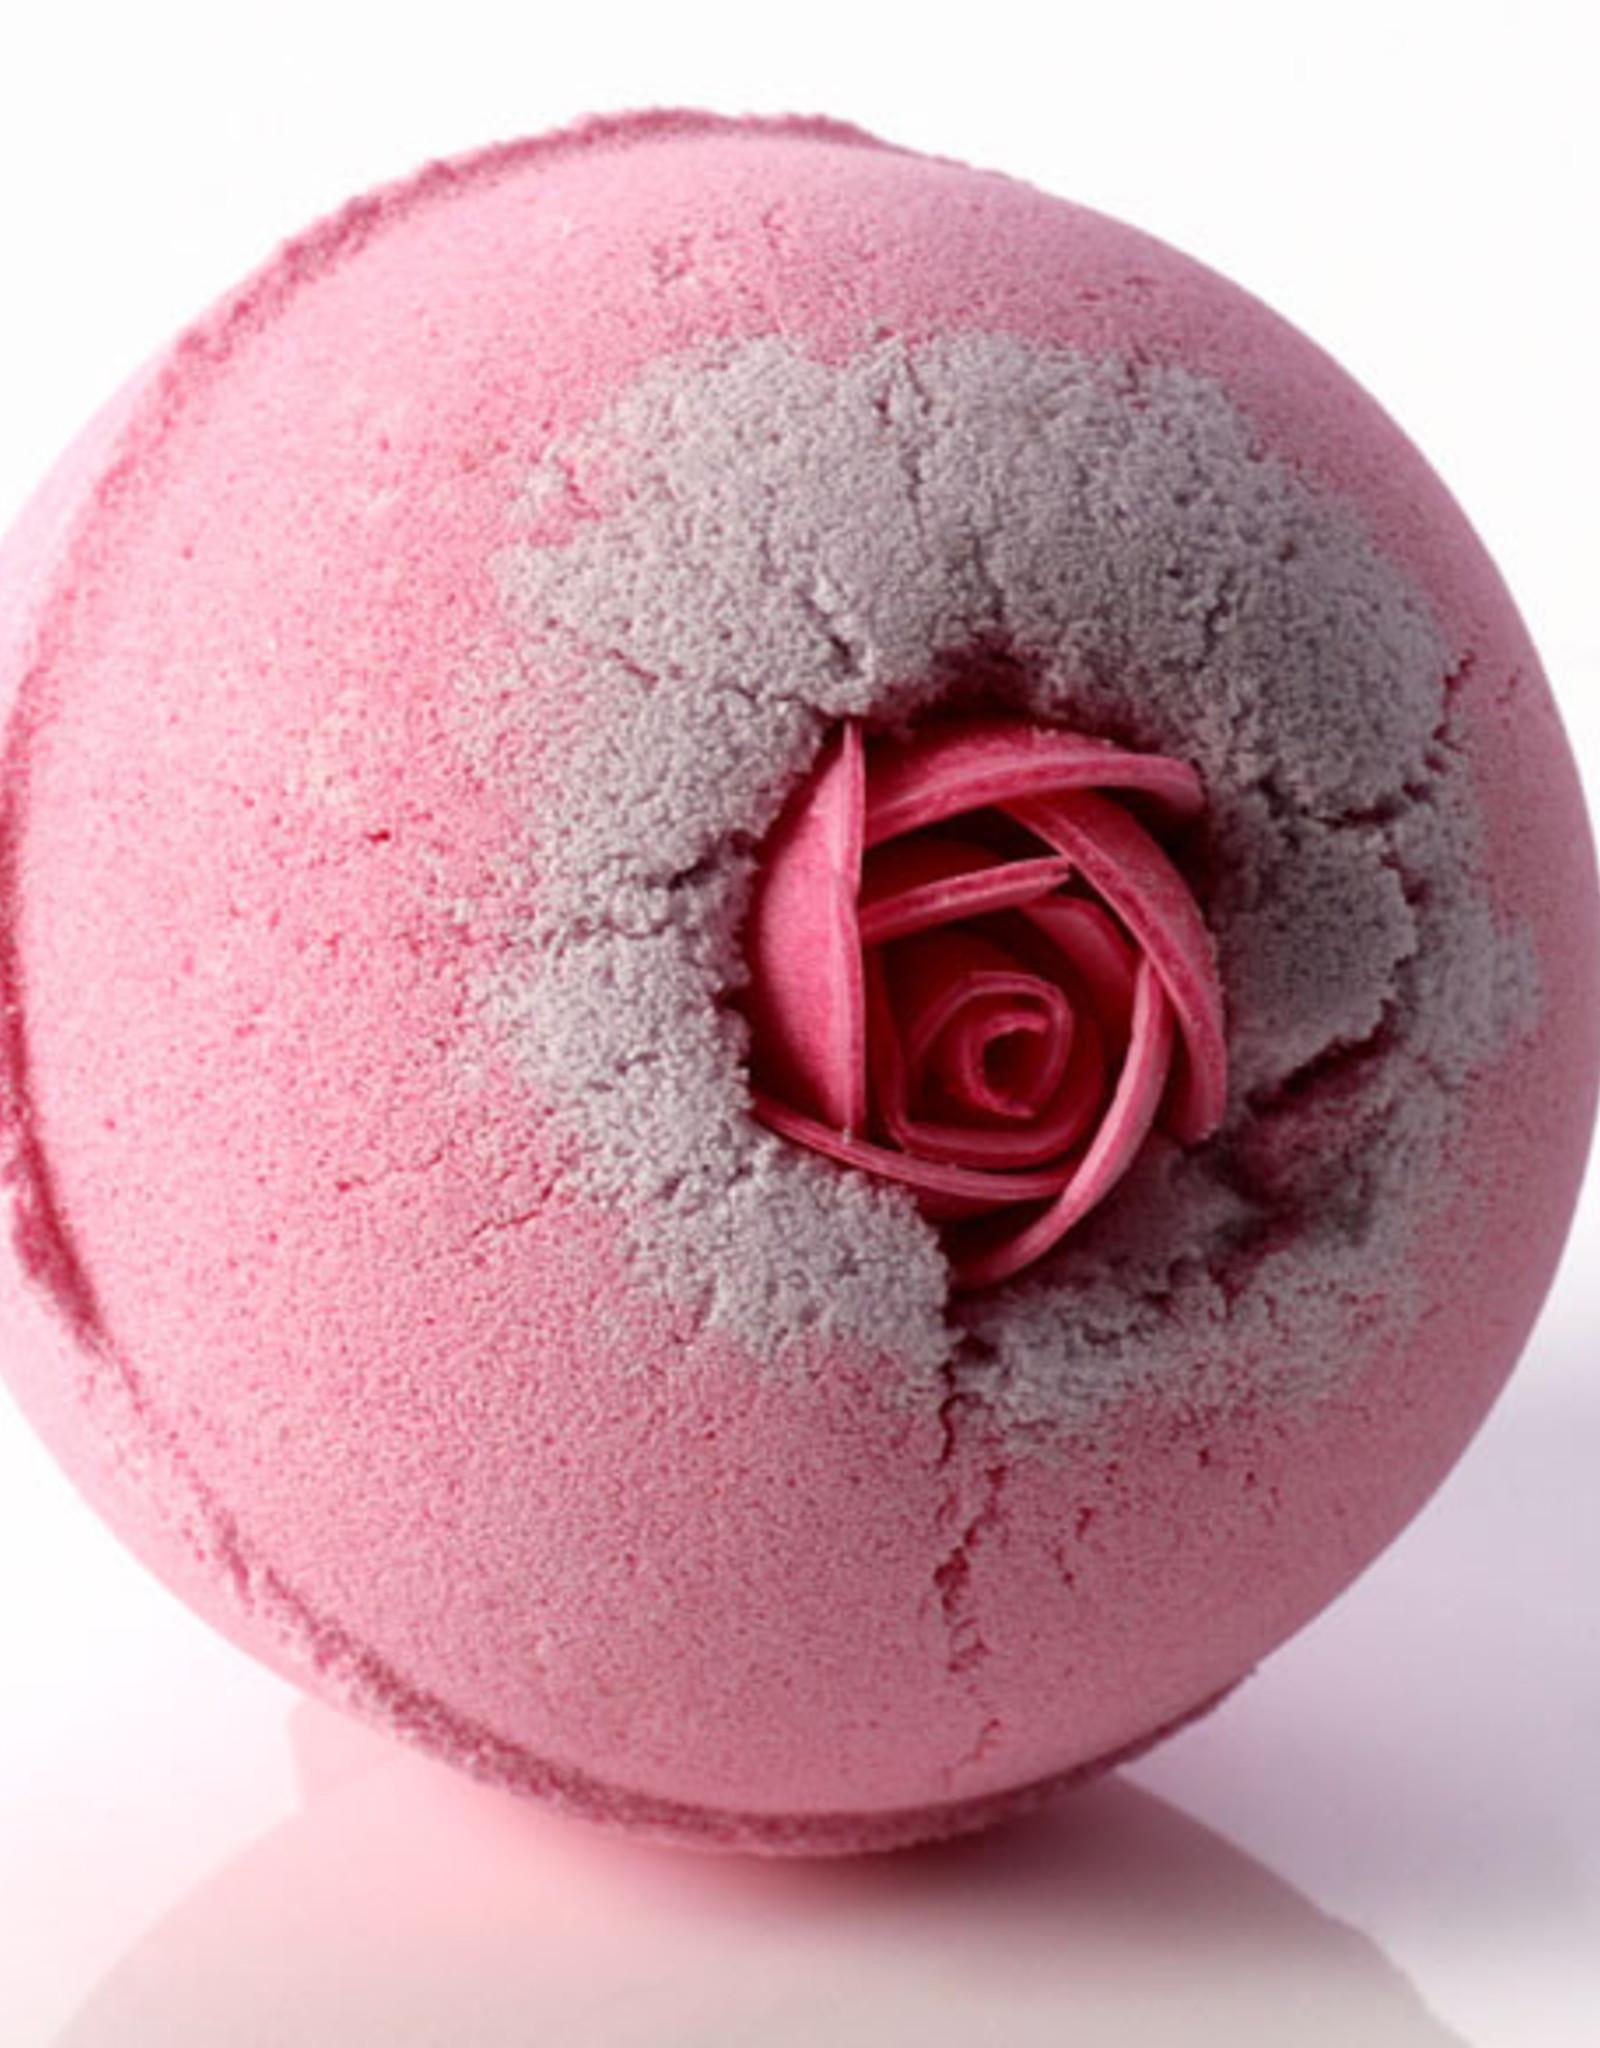 Bomb cosmetics Natures Candy Bath Blaster